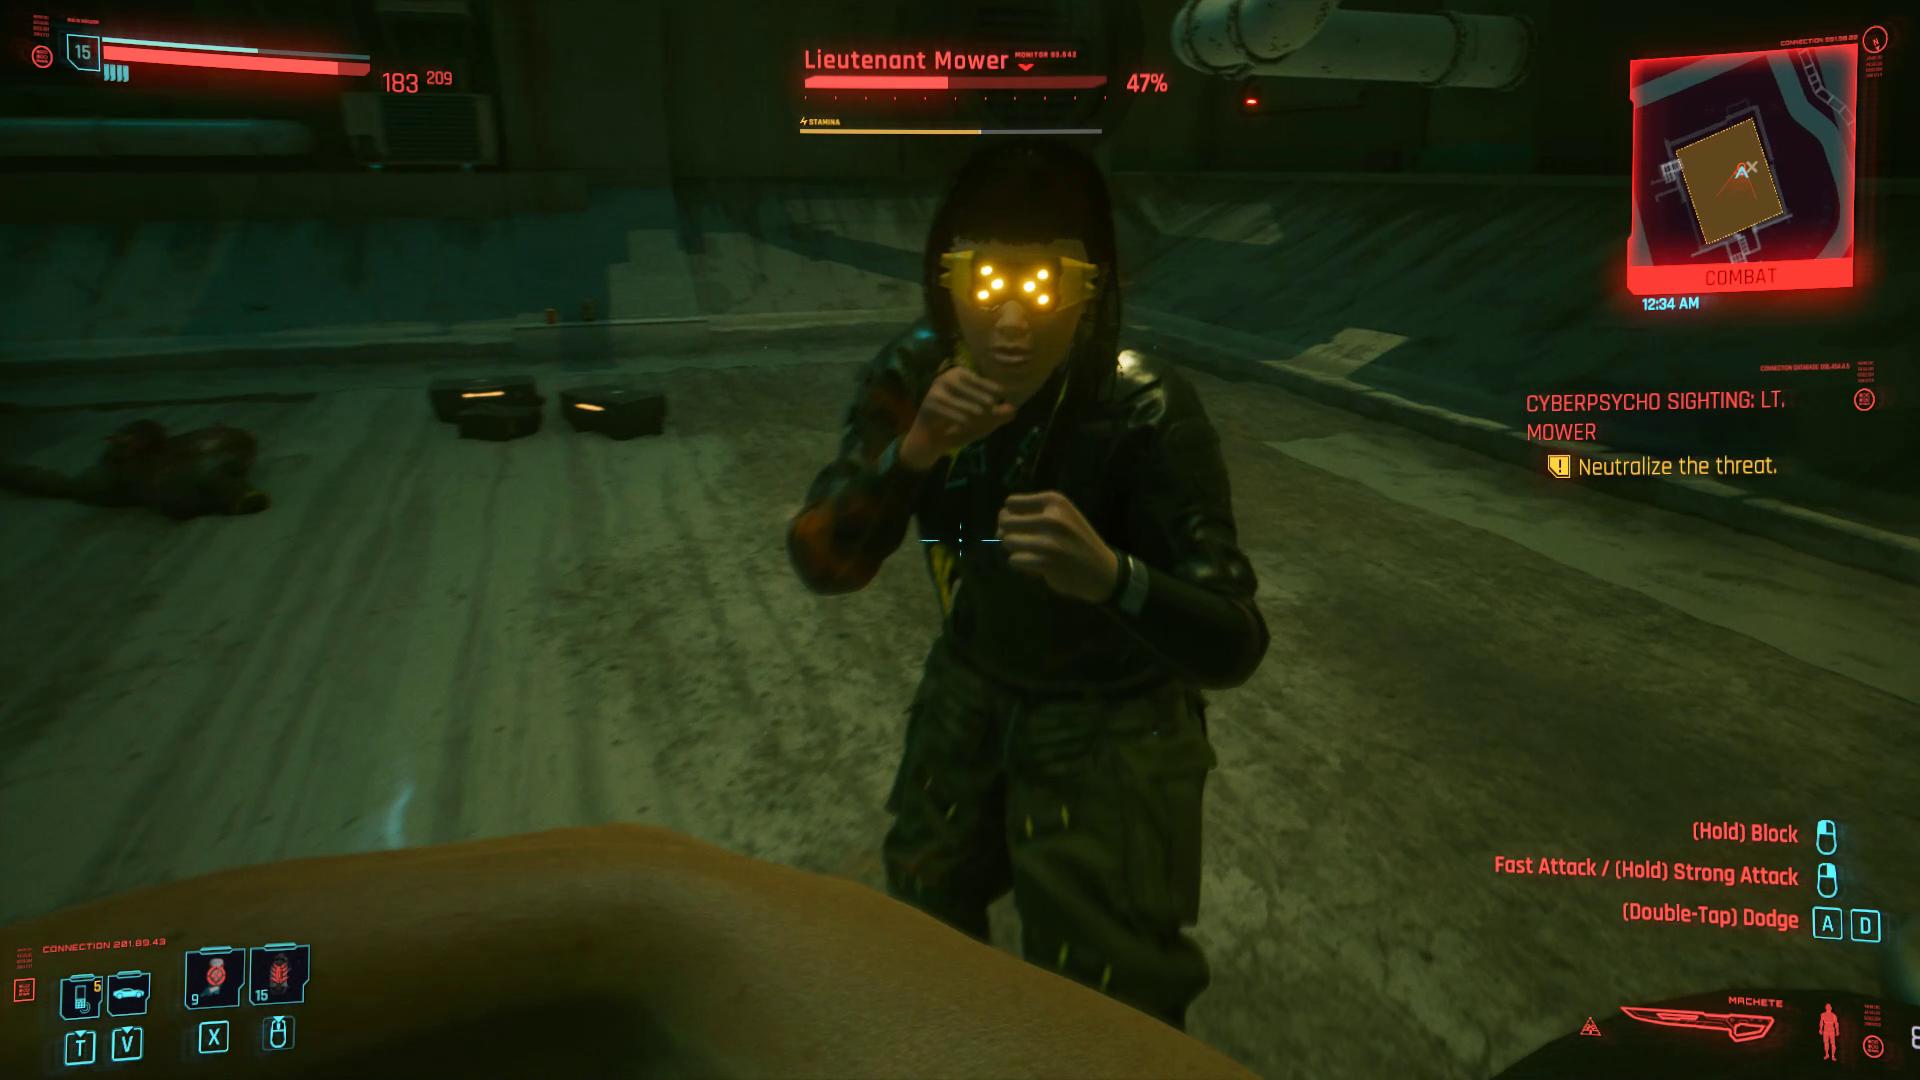 Tondeuse Cyberpsycho Lt 01